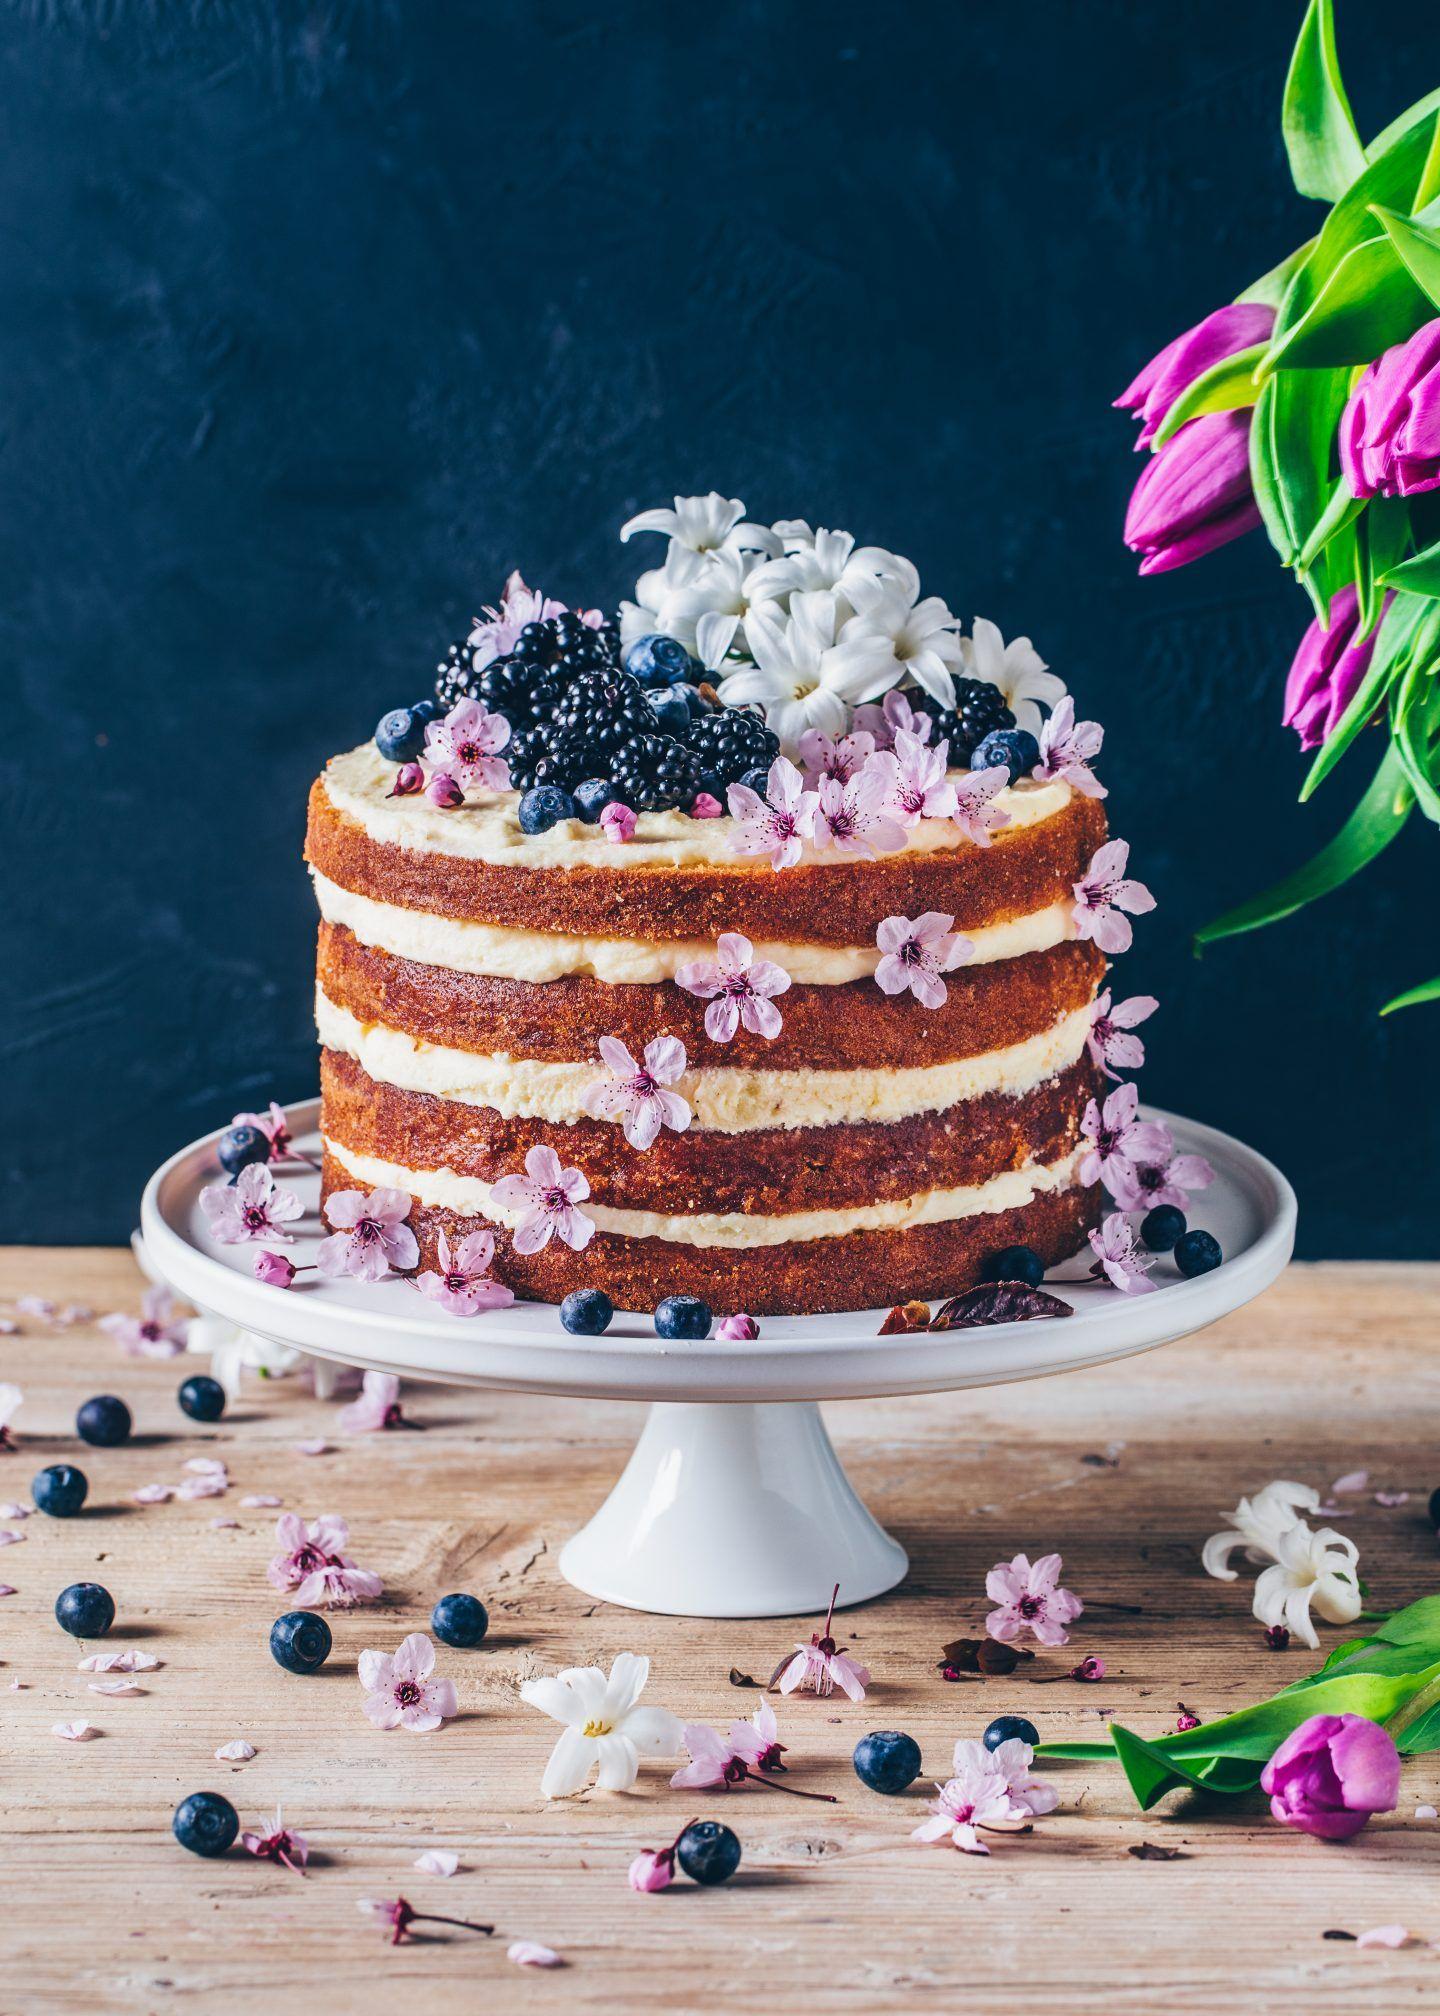 Lemon Blueberry Cake Vegan Layer Cake Bianca Zapatka Foodblog Blueberry Lemon Cake Vegan Cake Recipes Vegan Lemon Cake